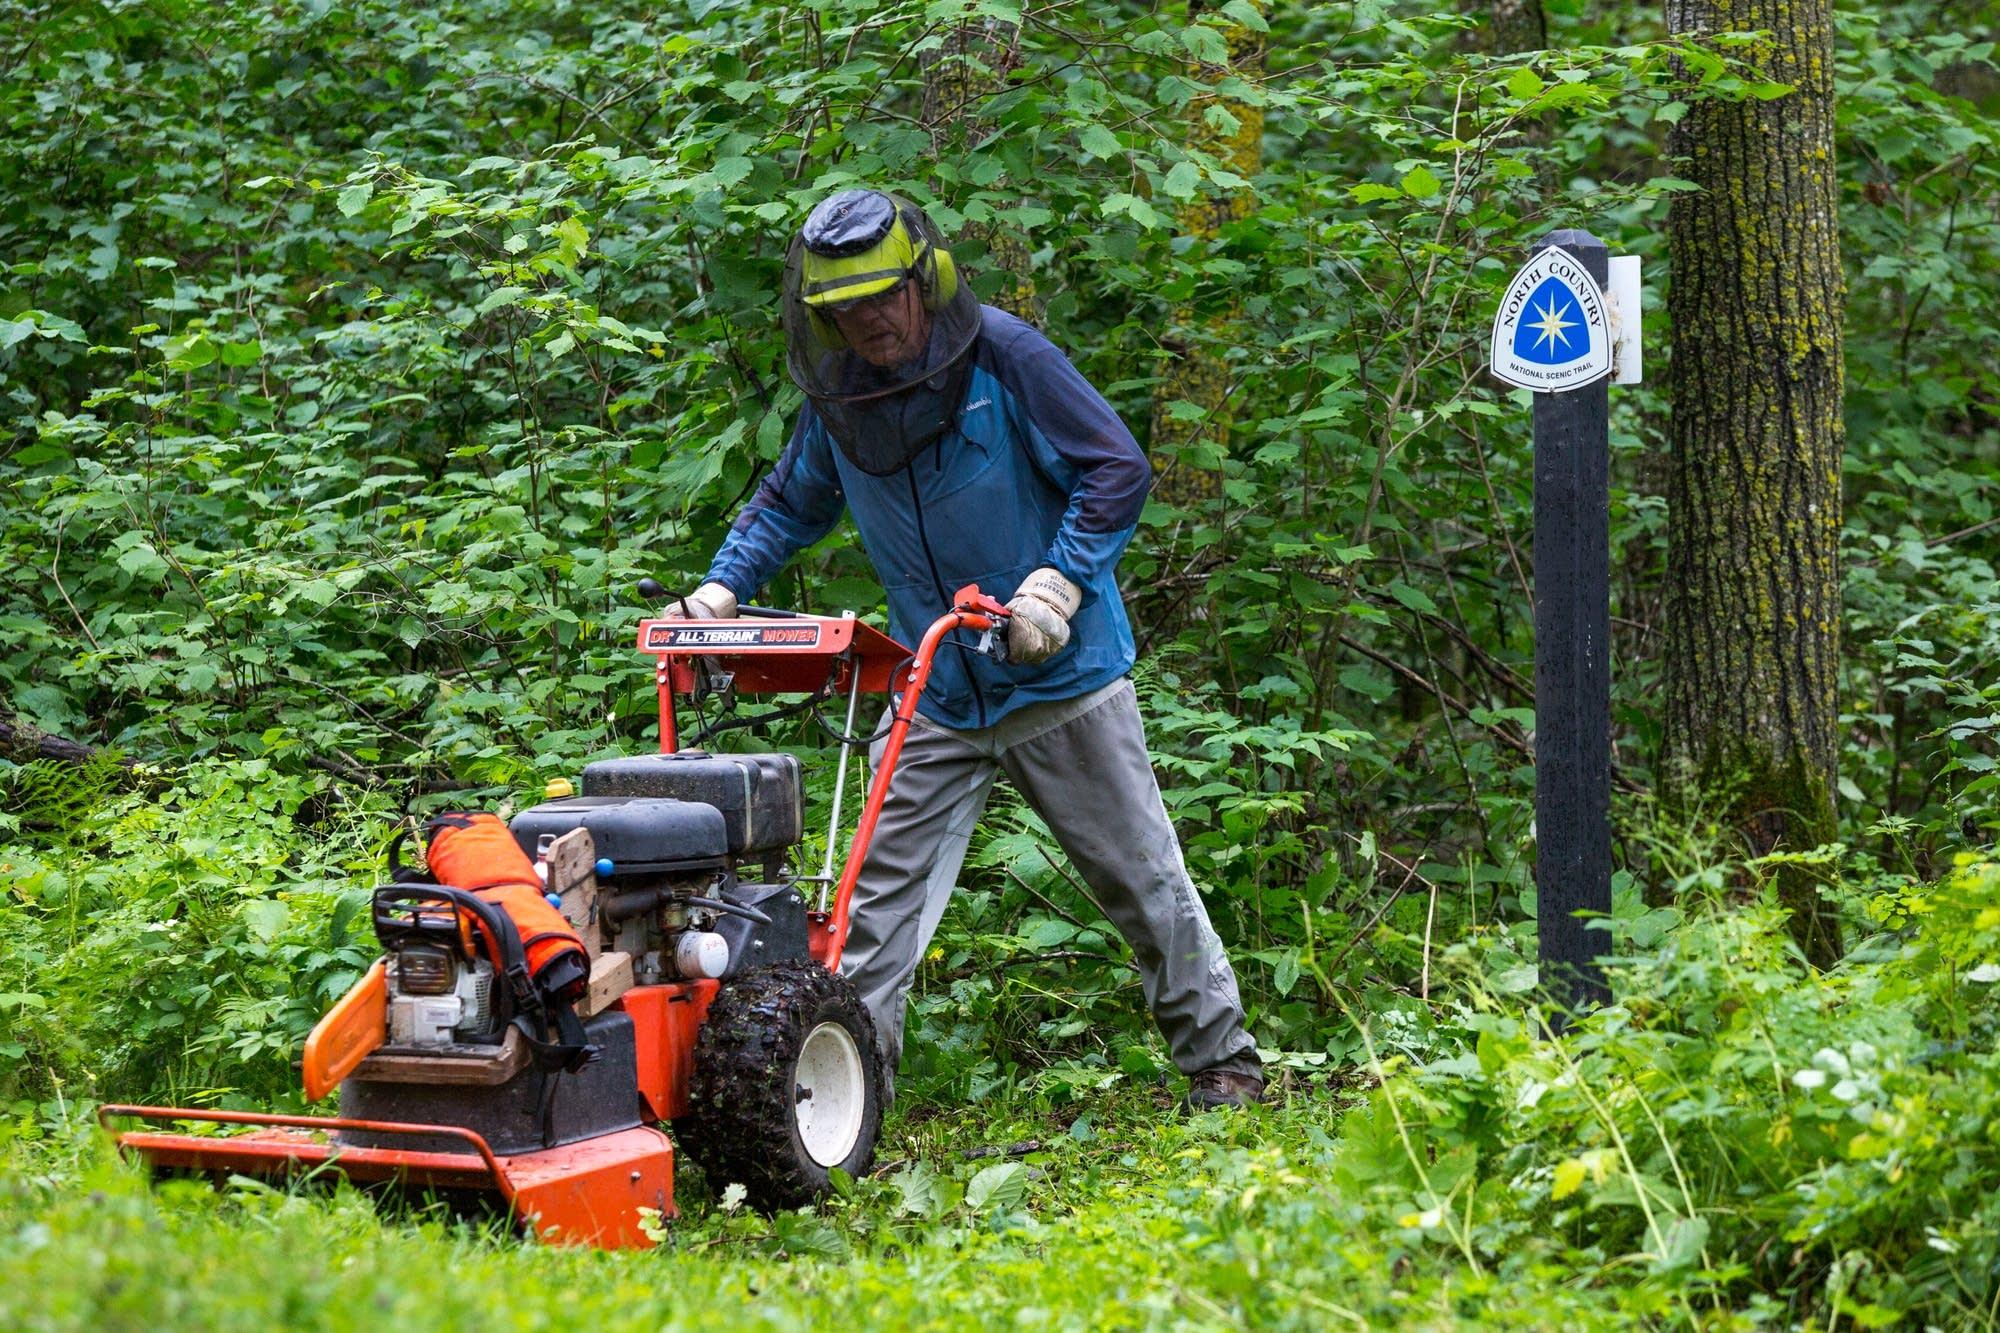 Jim Rakness pushes a mower